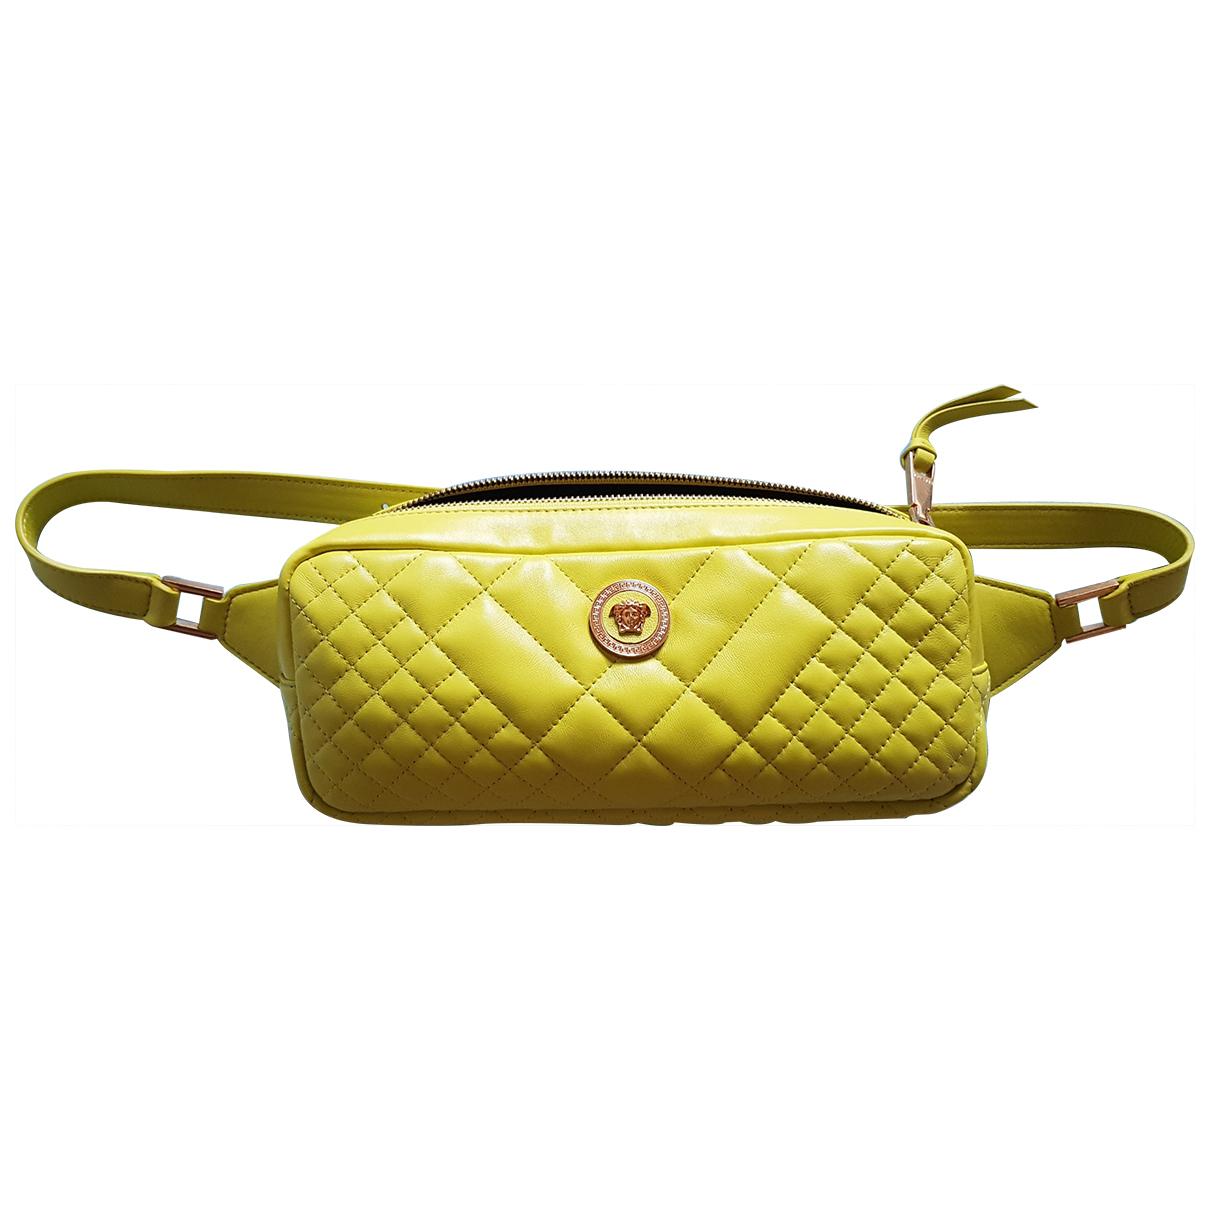 Versace \N Yellow Leather handbag for Women \N